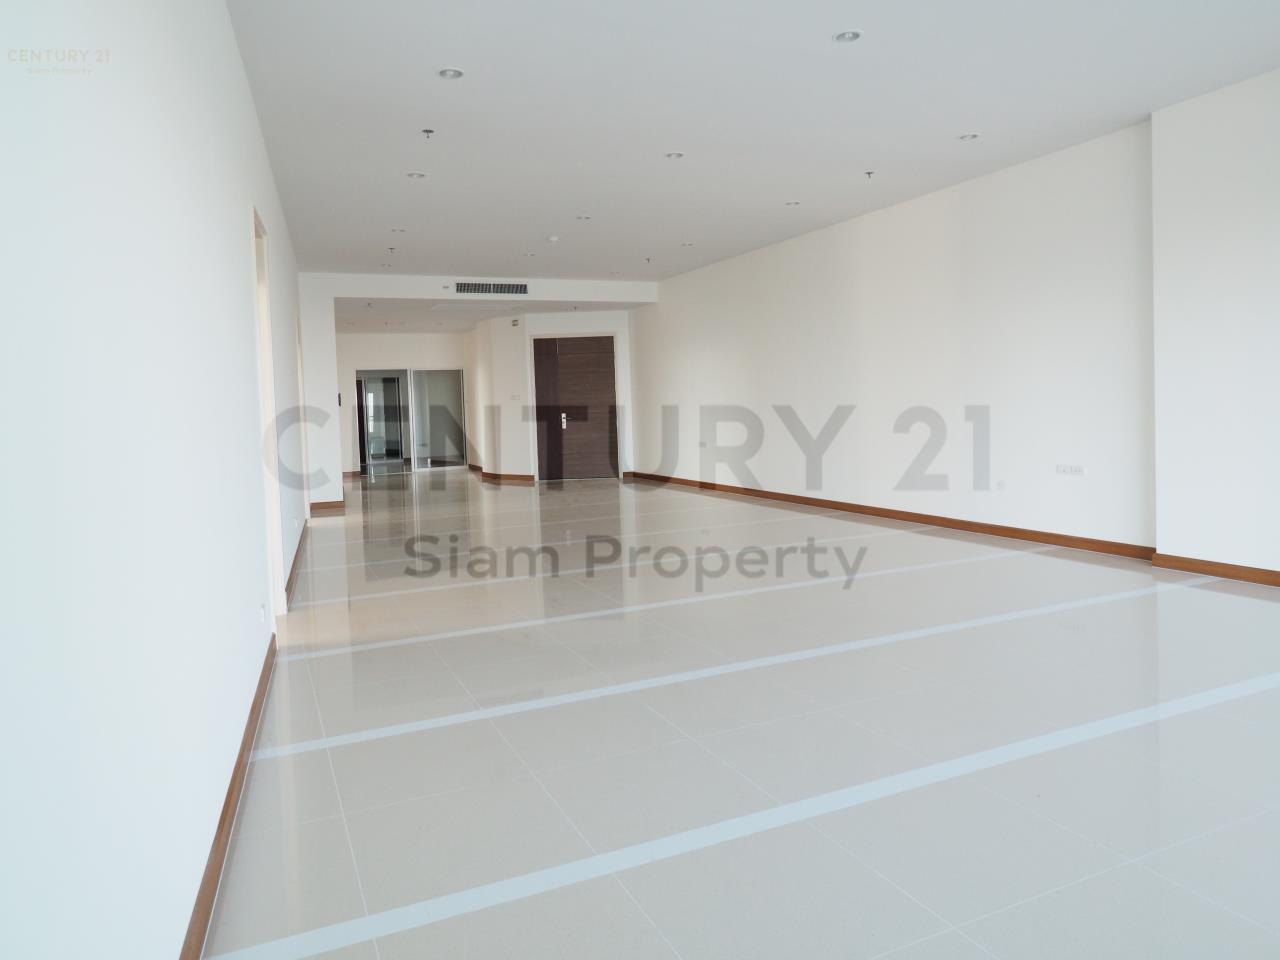 Century21 Siam Property Agency's Supalai Prima Riva 11